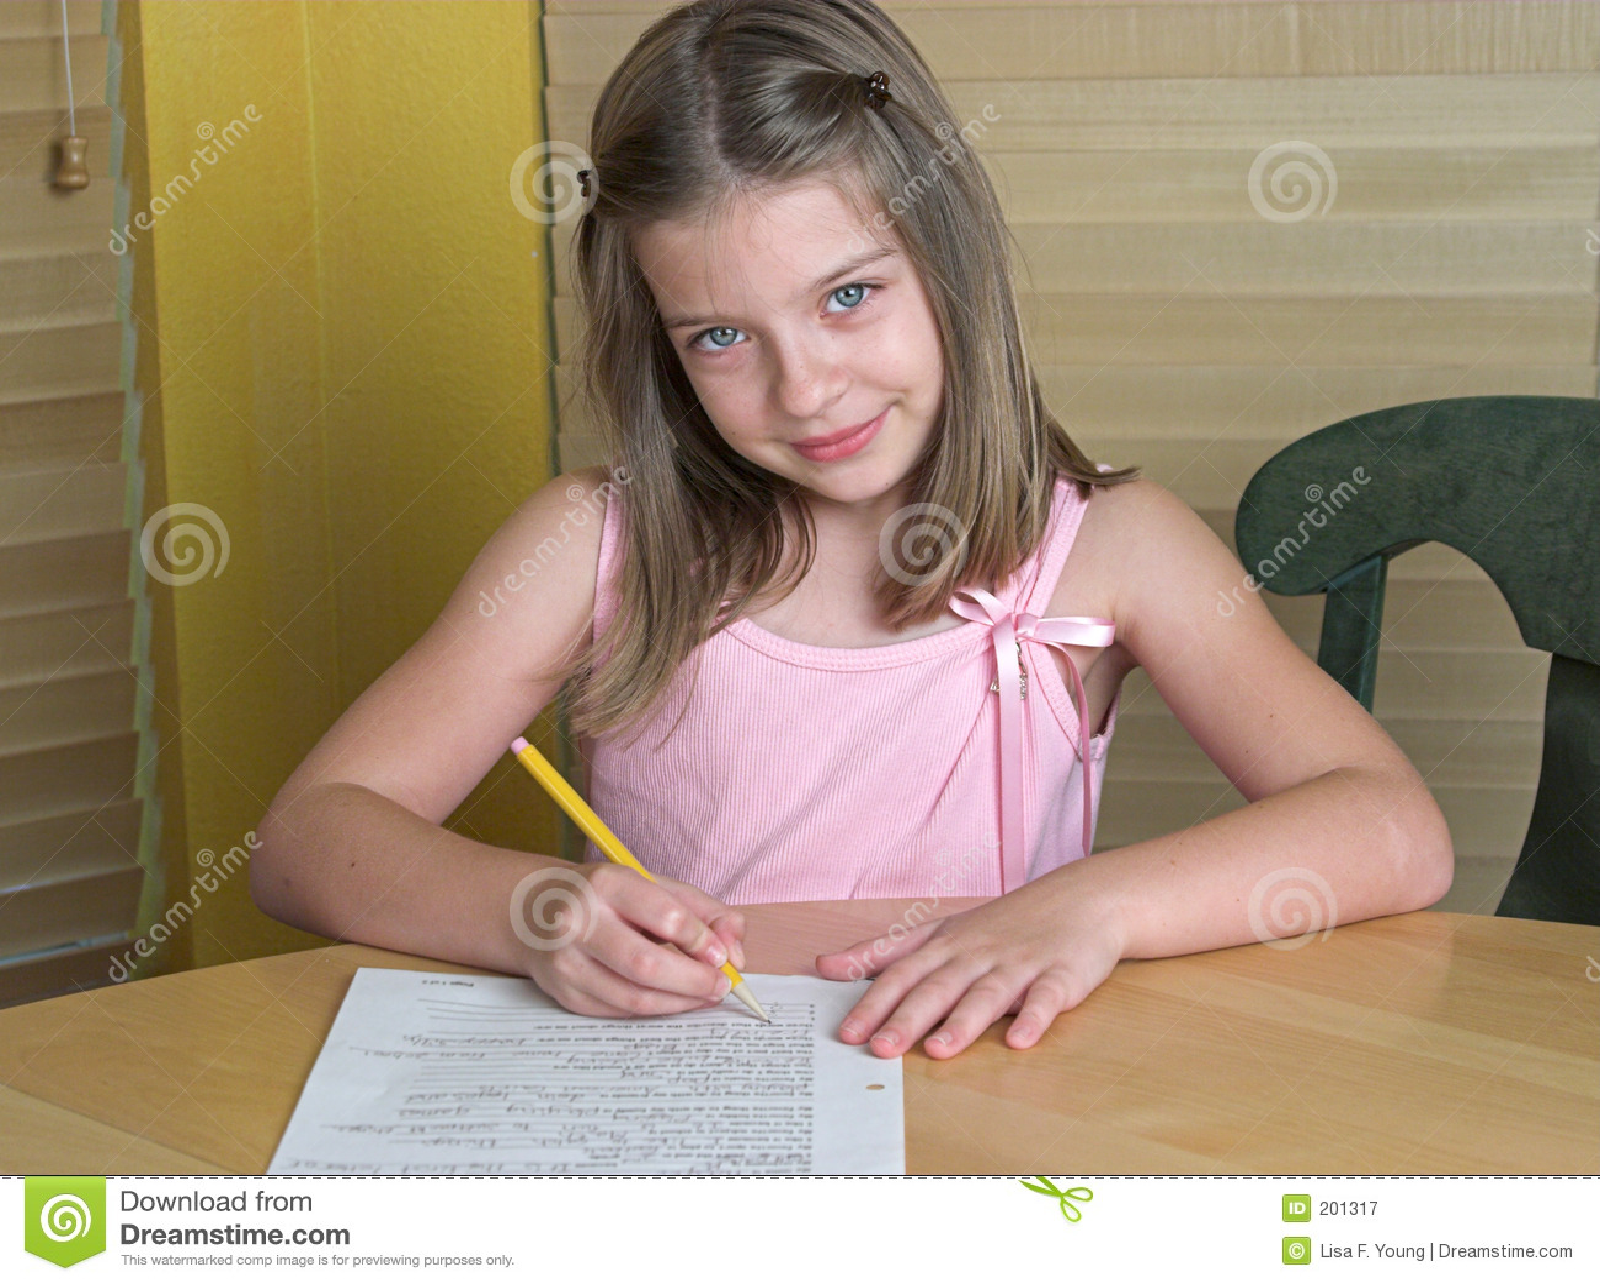 test your essay for plagiarism